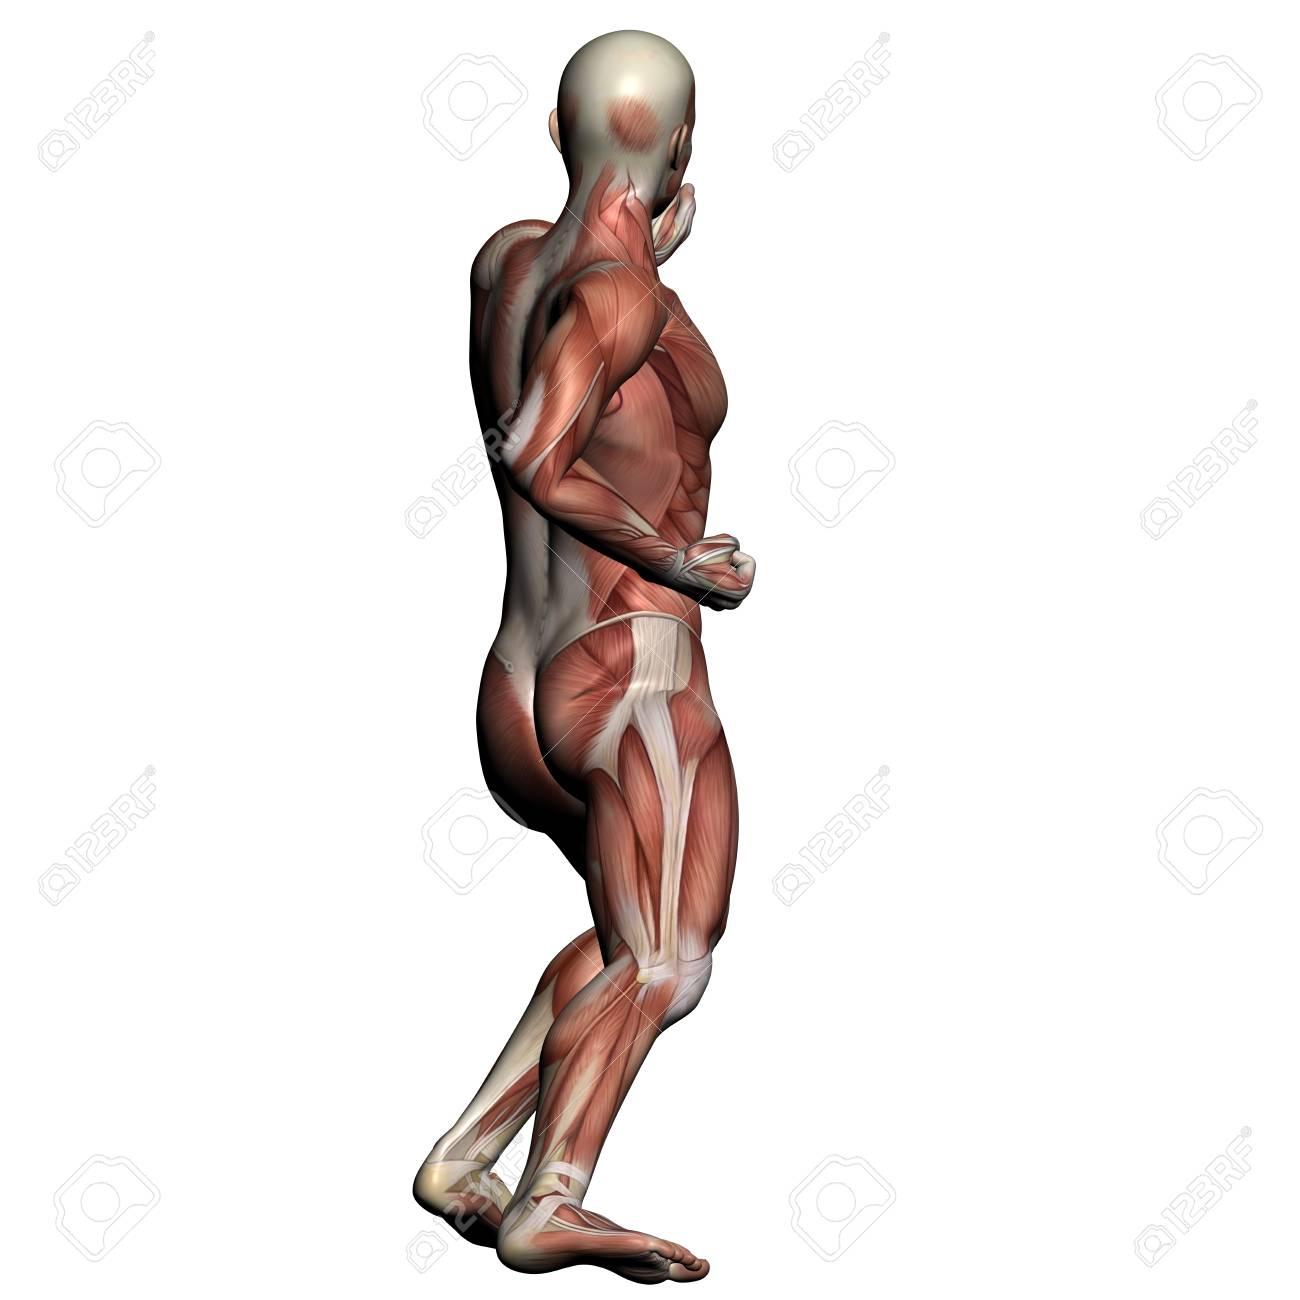 Niedlich Anatomy 3d Software Fotos - Anatomie Ideen - finotti.info